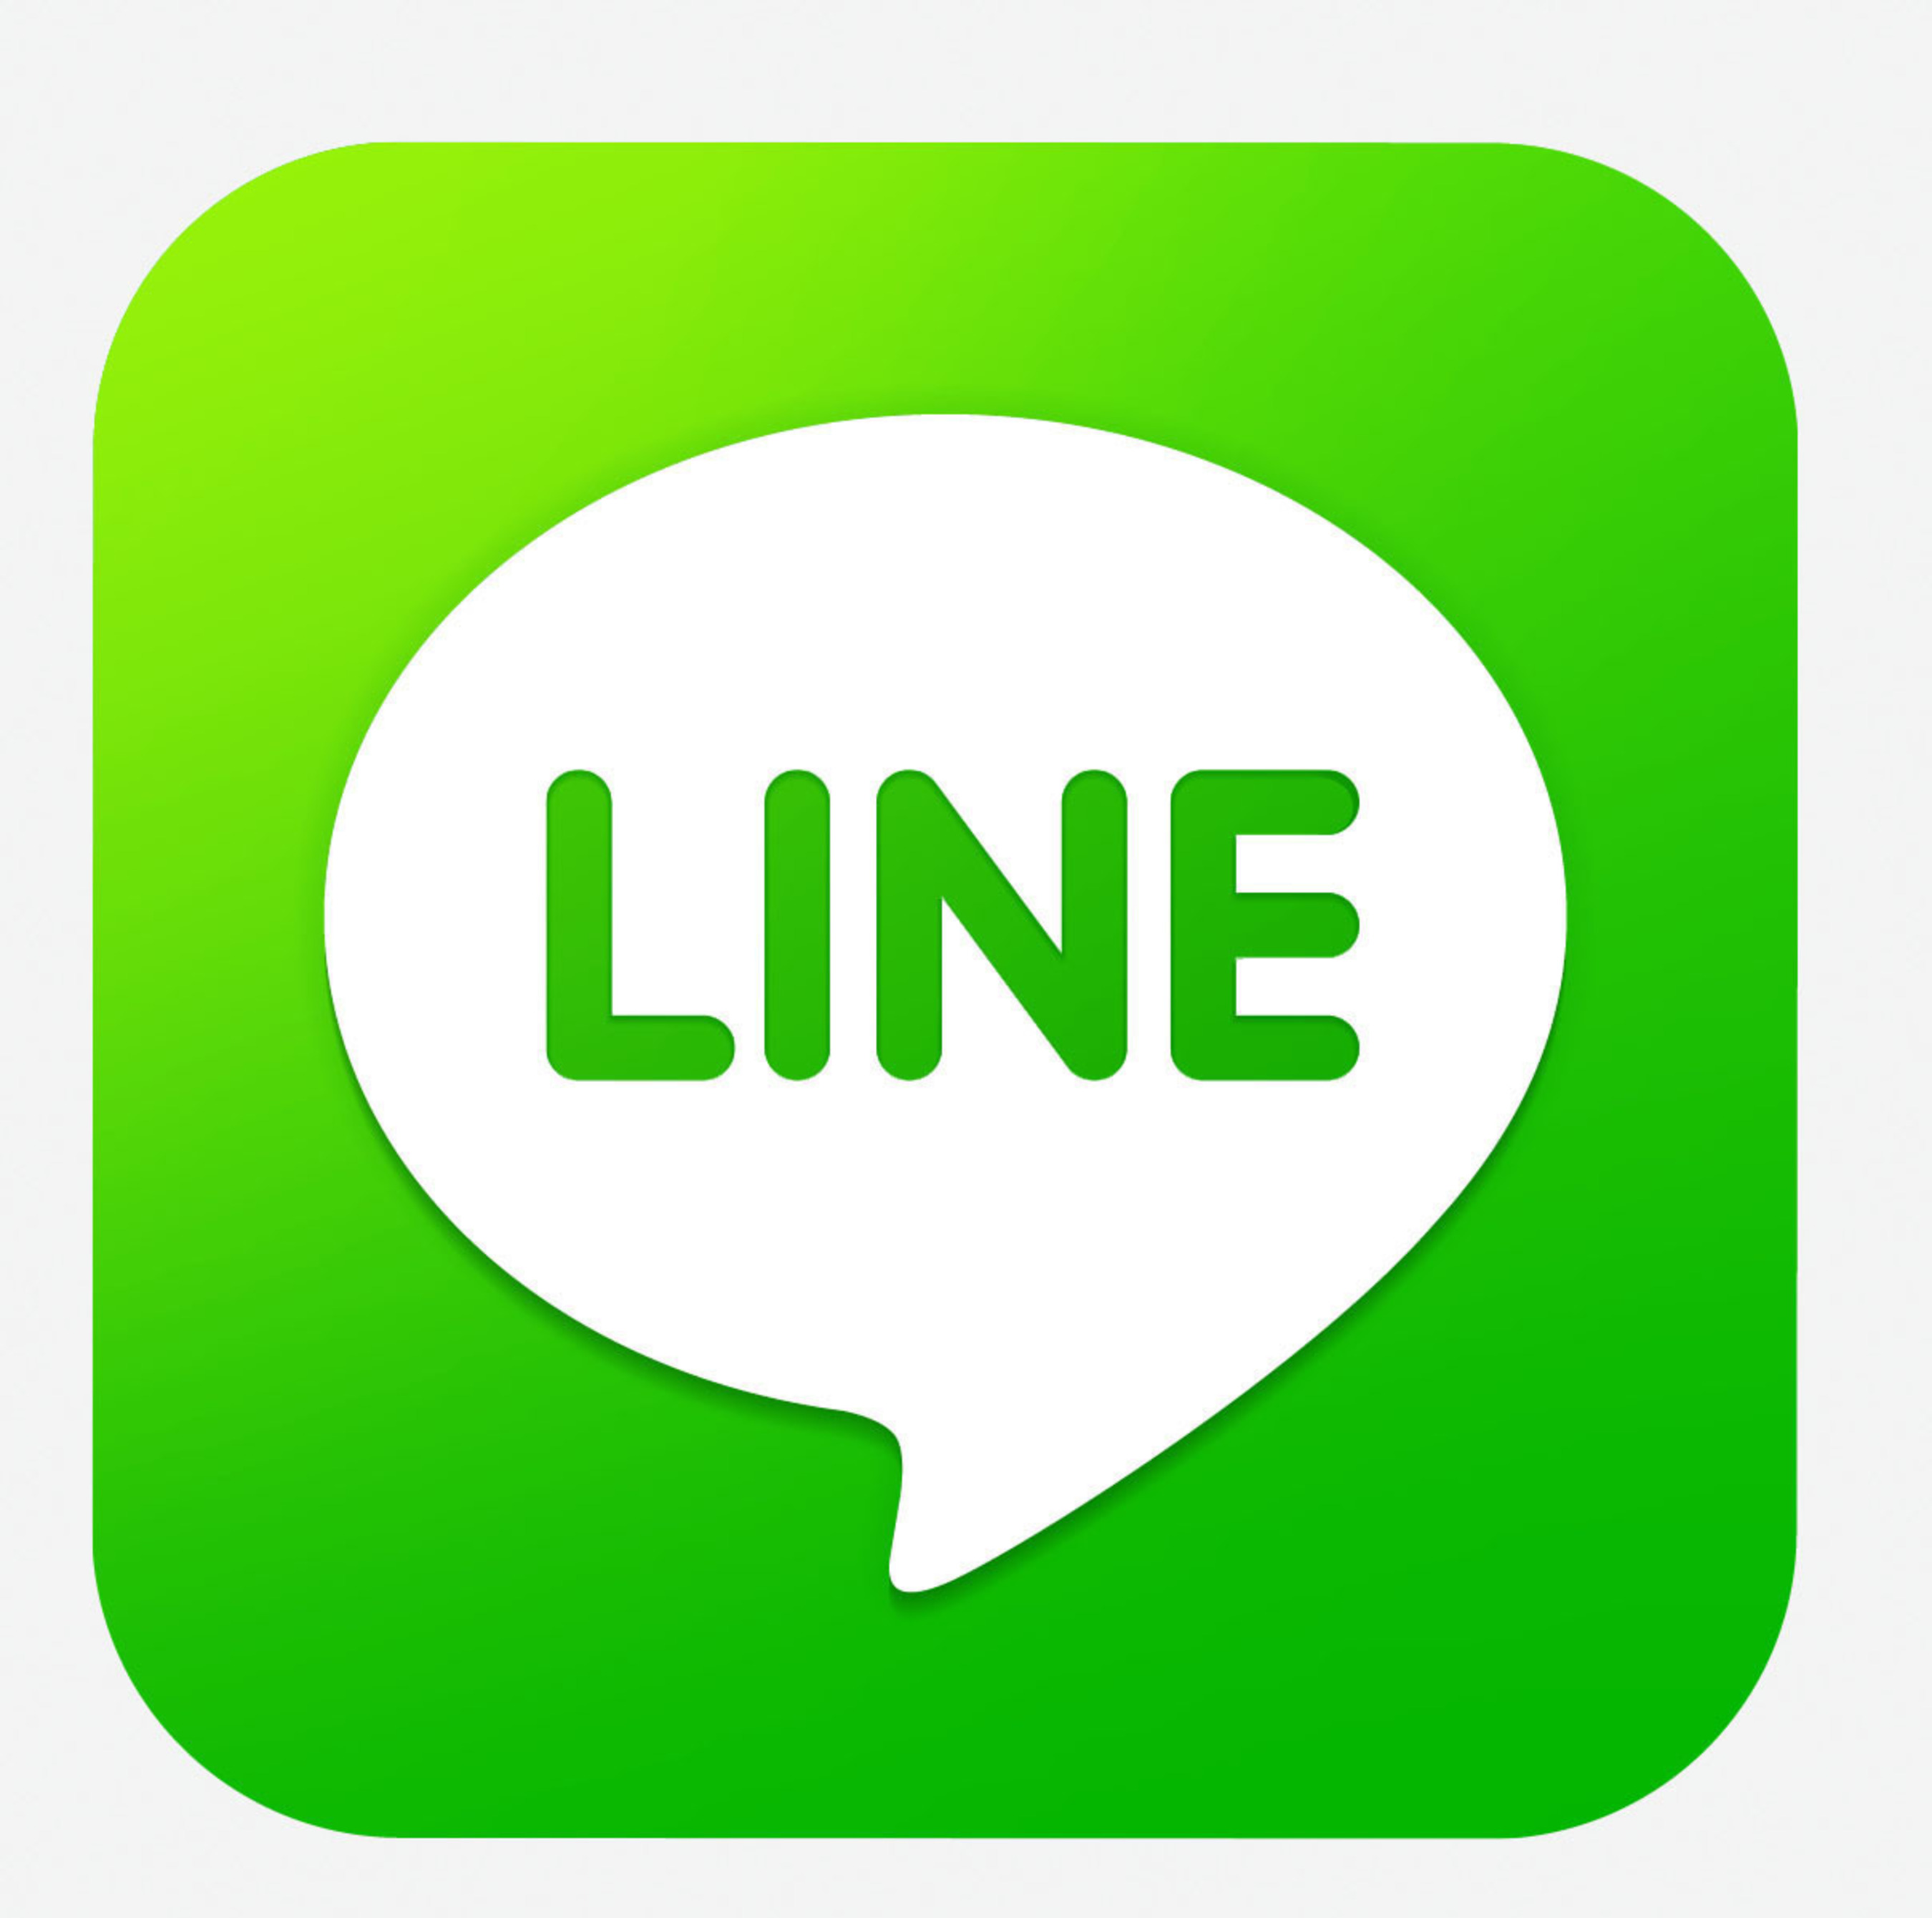 LINE logo. (PRNewsFoto/LINE Corporation) (PRNewsFoto/LINE CORPORATION)